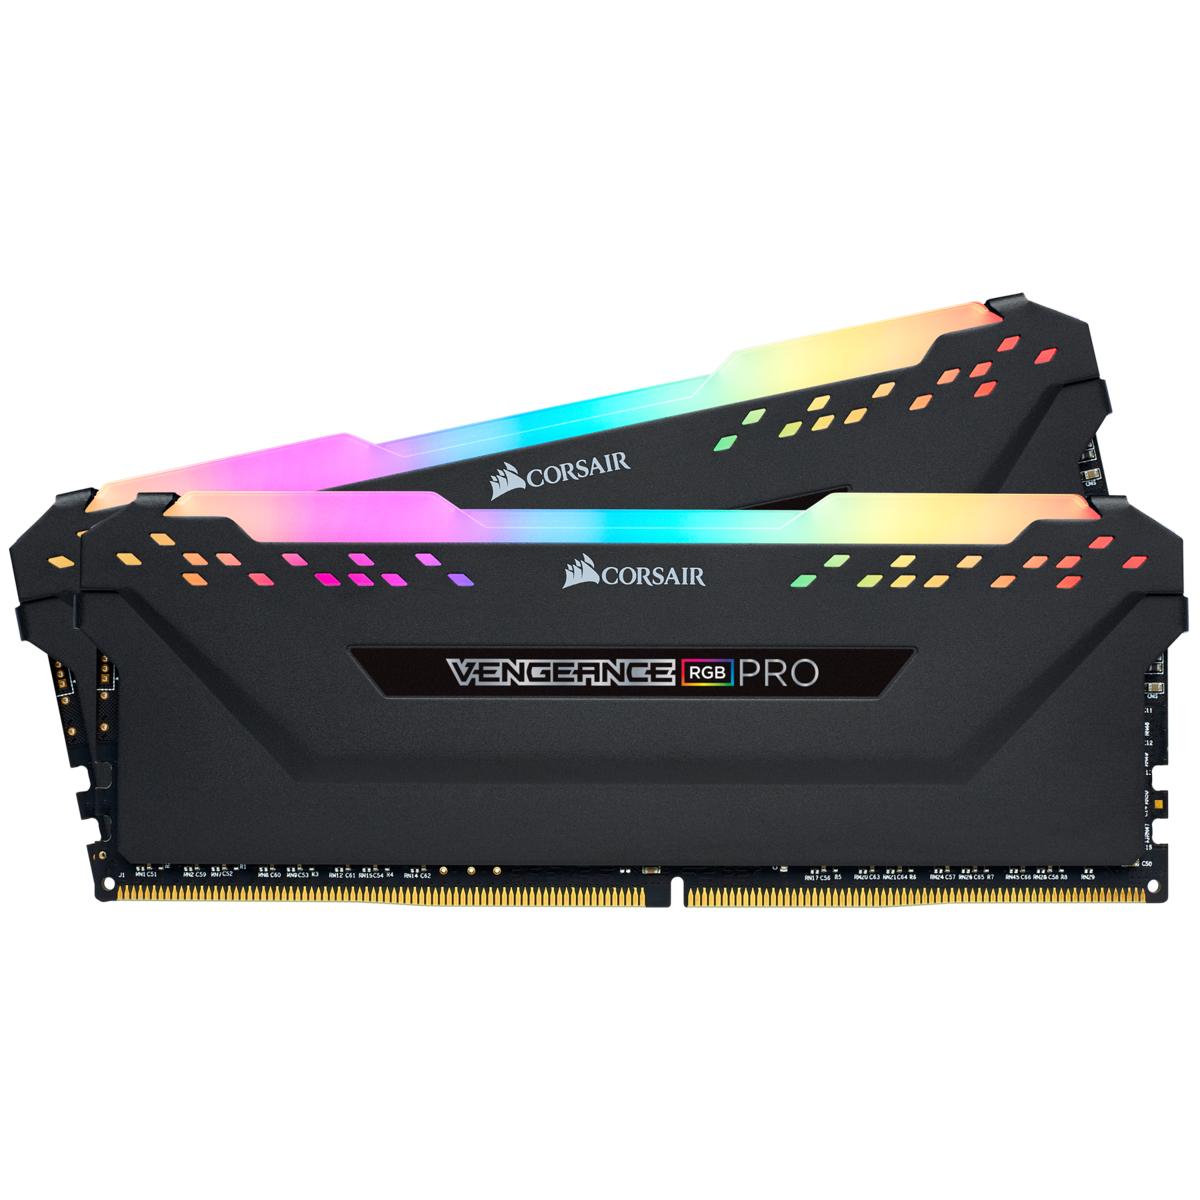 Kit mémoire RAM DDR4 Corsair RGB Pro - 32Go (2 x 16 Go) - 3200MHz, C16 (CMW32GX4M2E3200C16)